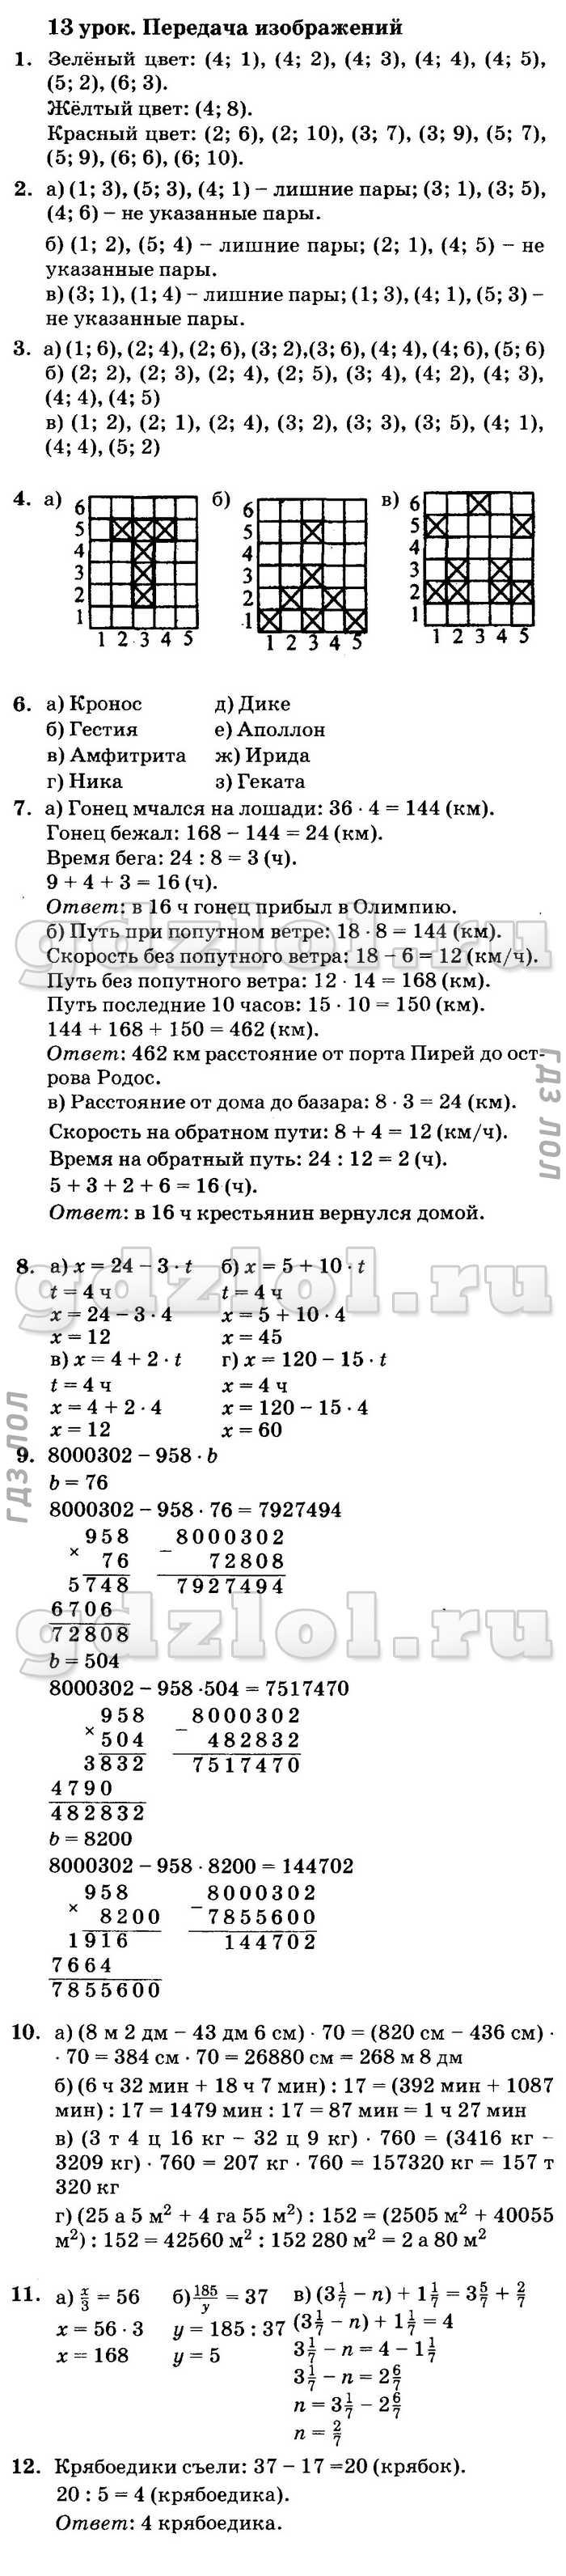 Спишу.ру 5 класс математика петерсон 2017 год